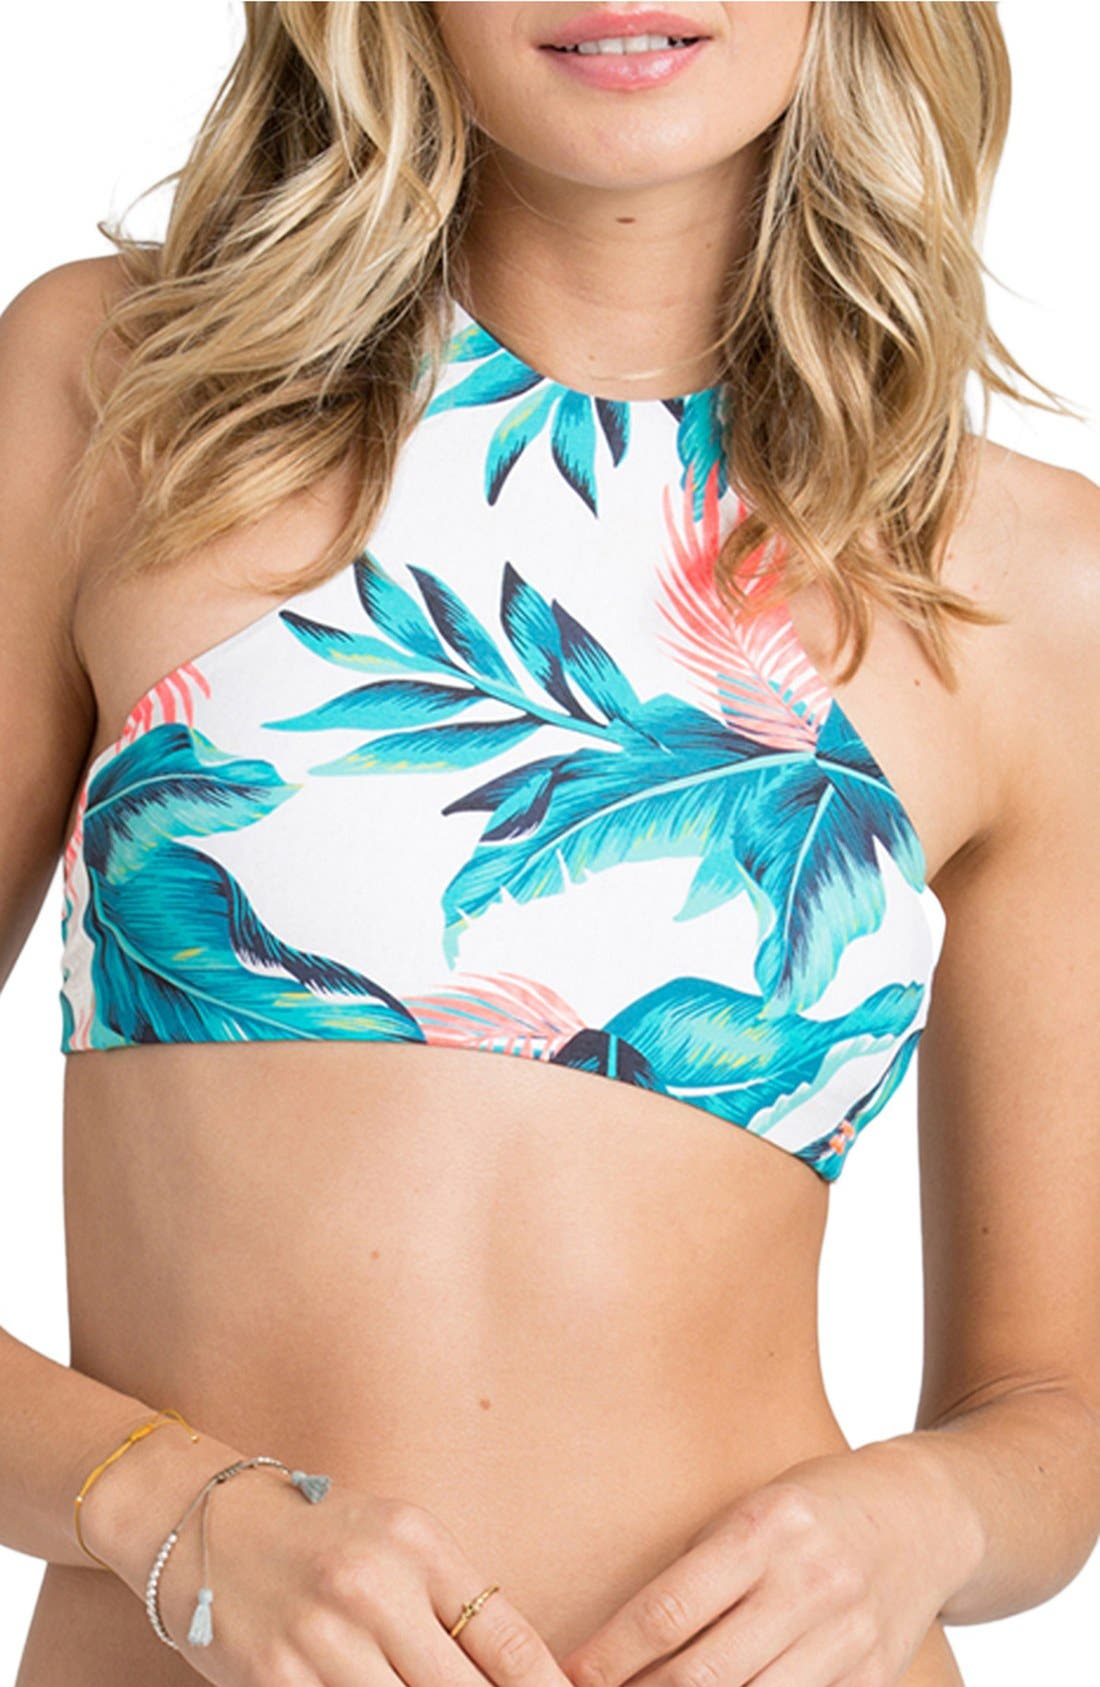 Alternate Image 1 Selected - Billabong 'Tropical Daze' High Neck Halter Bikini Top